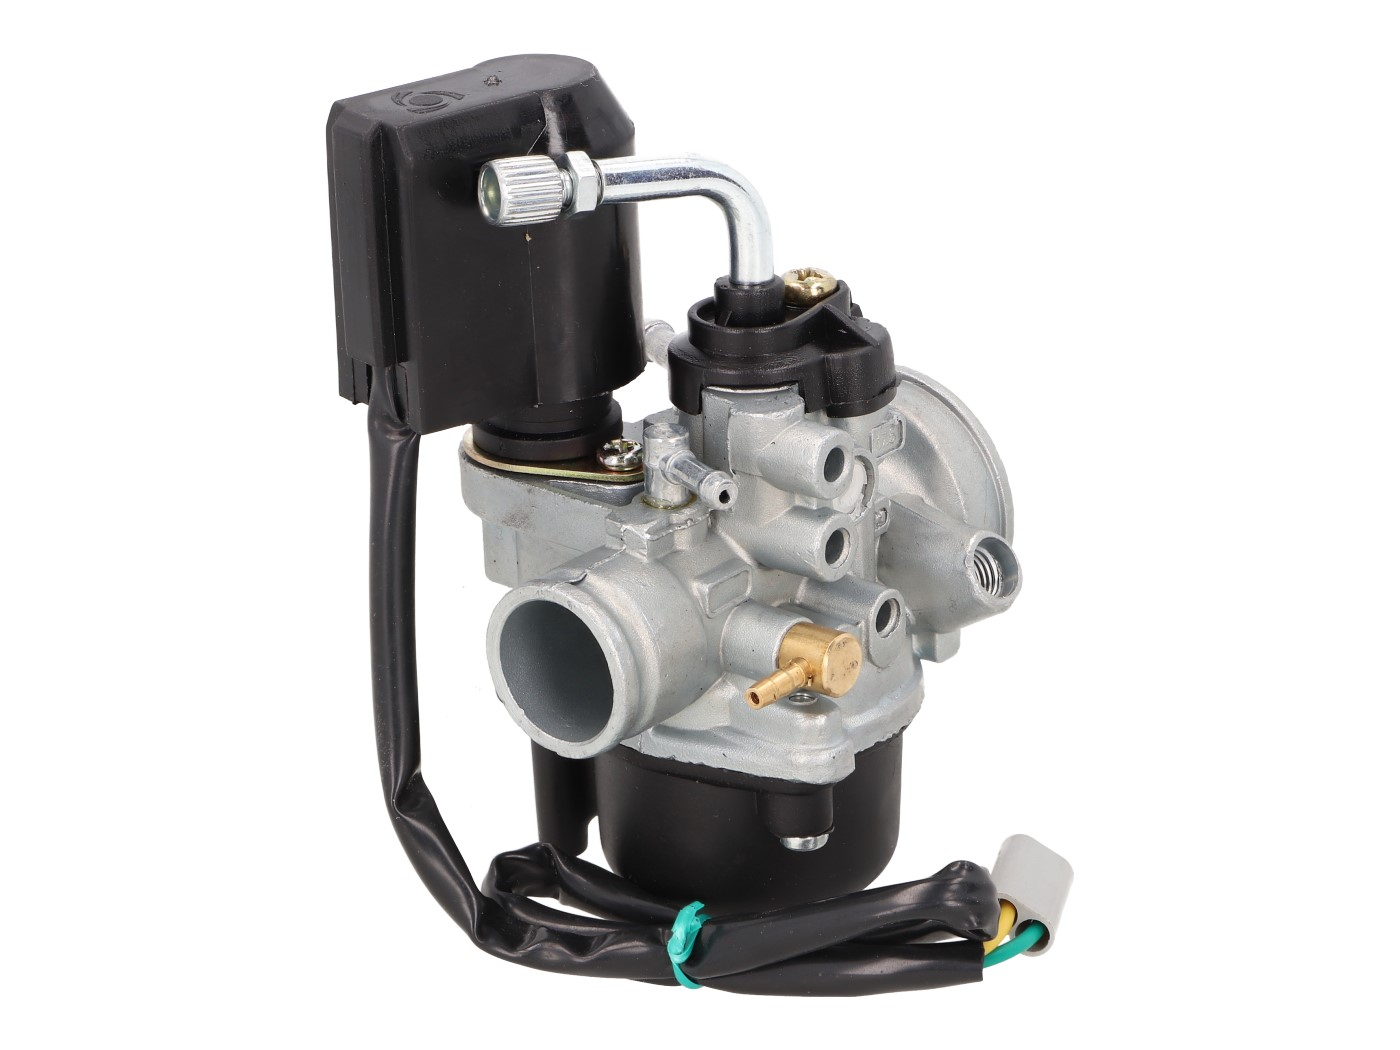 carburetor Naraku 17 5mm electric choke for Piaggio, Keeway, CPI